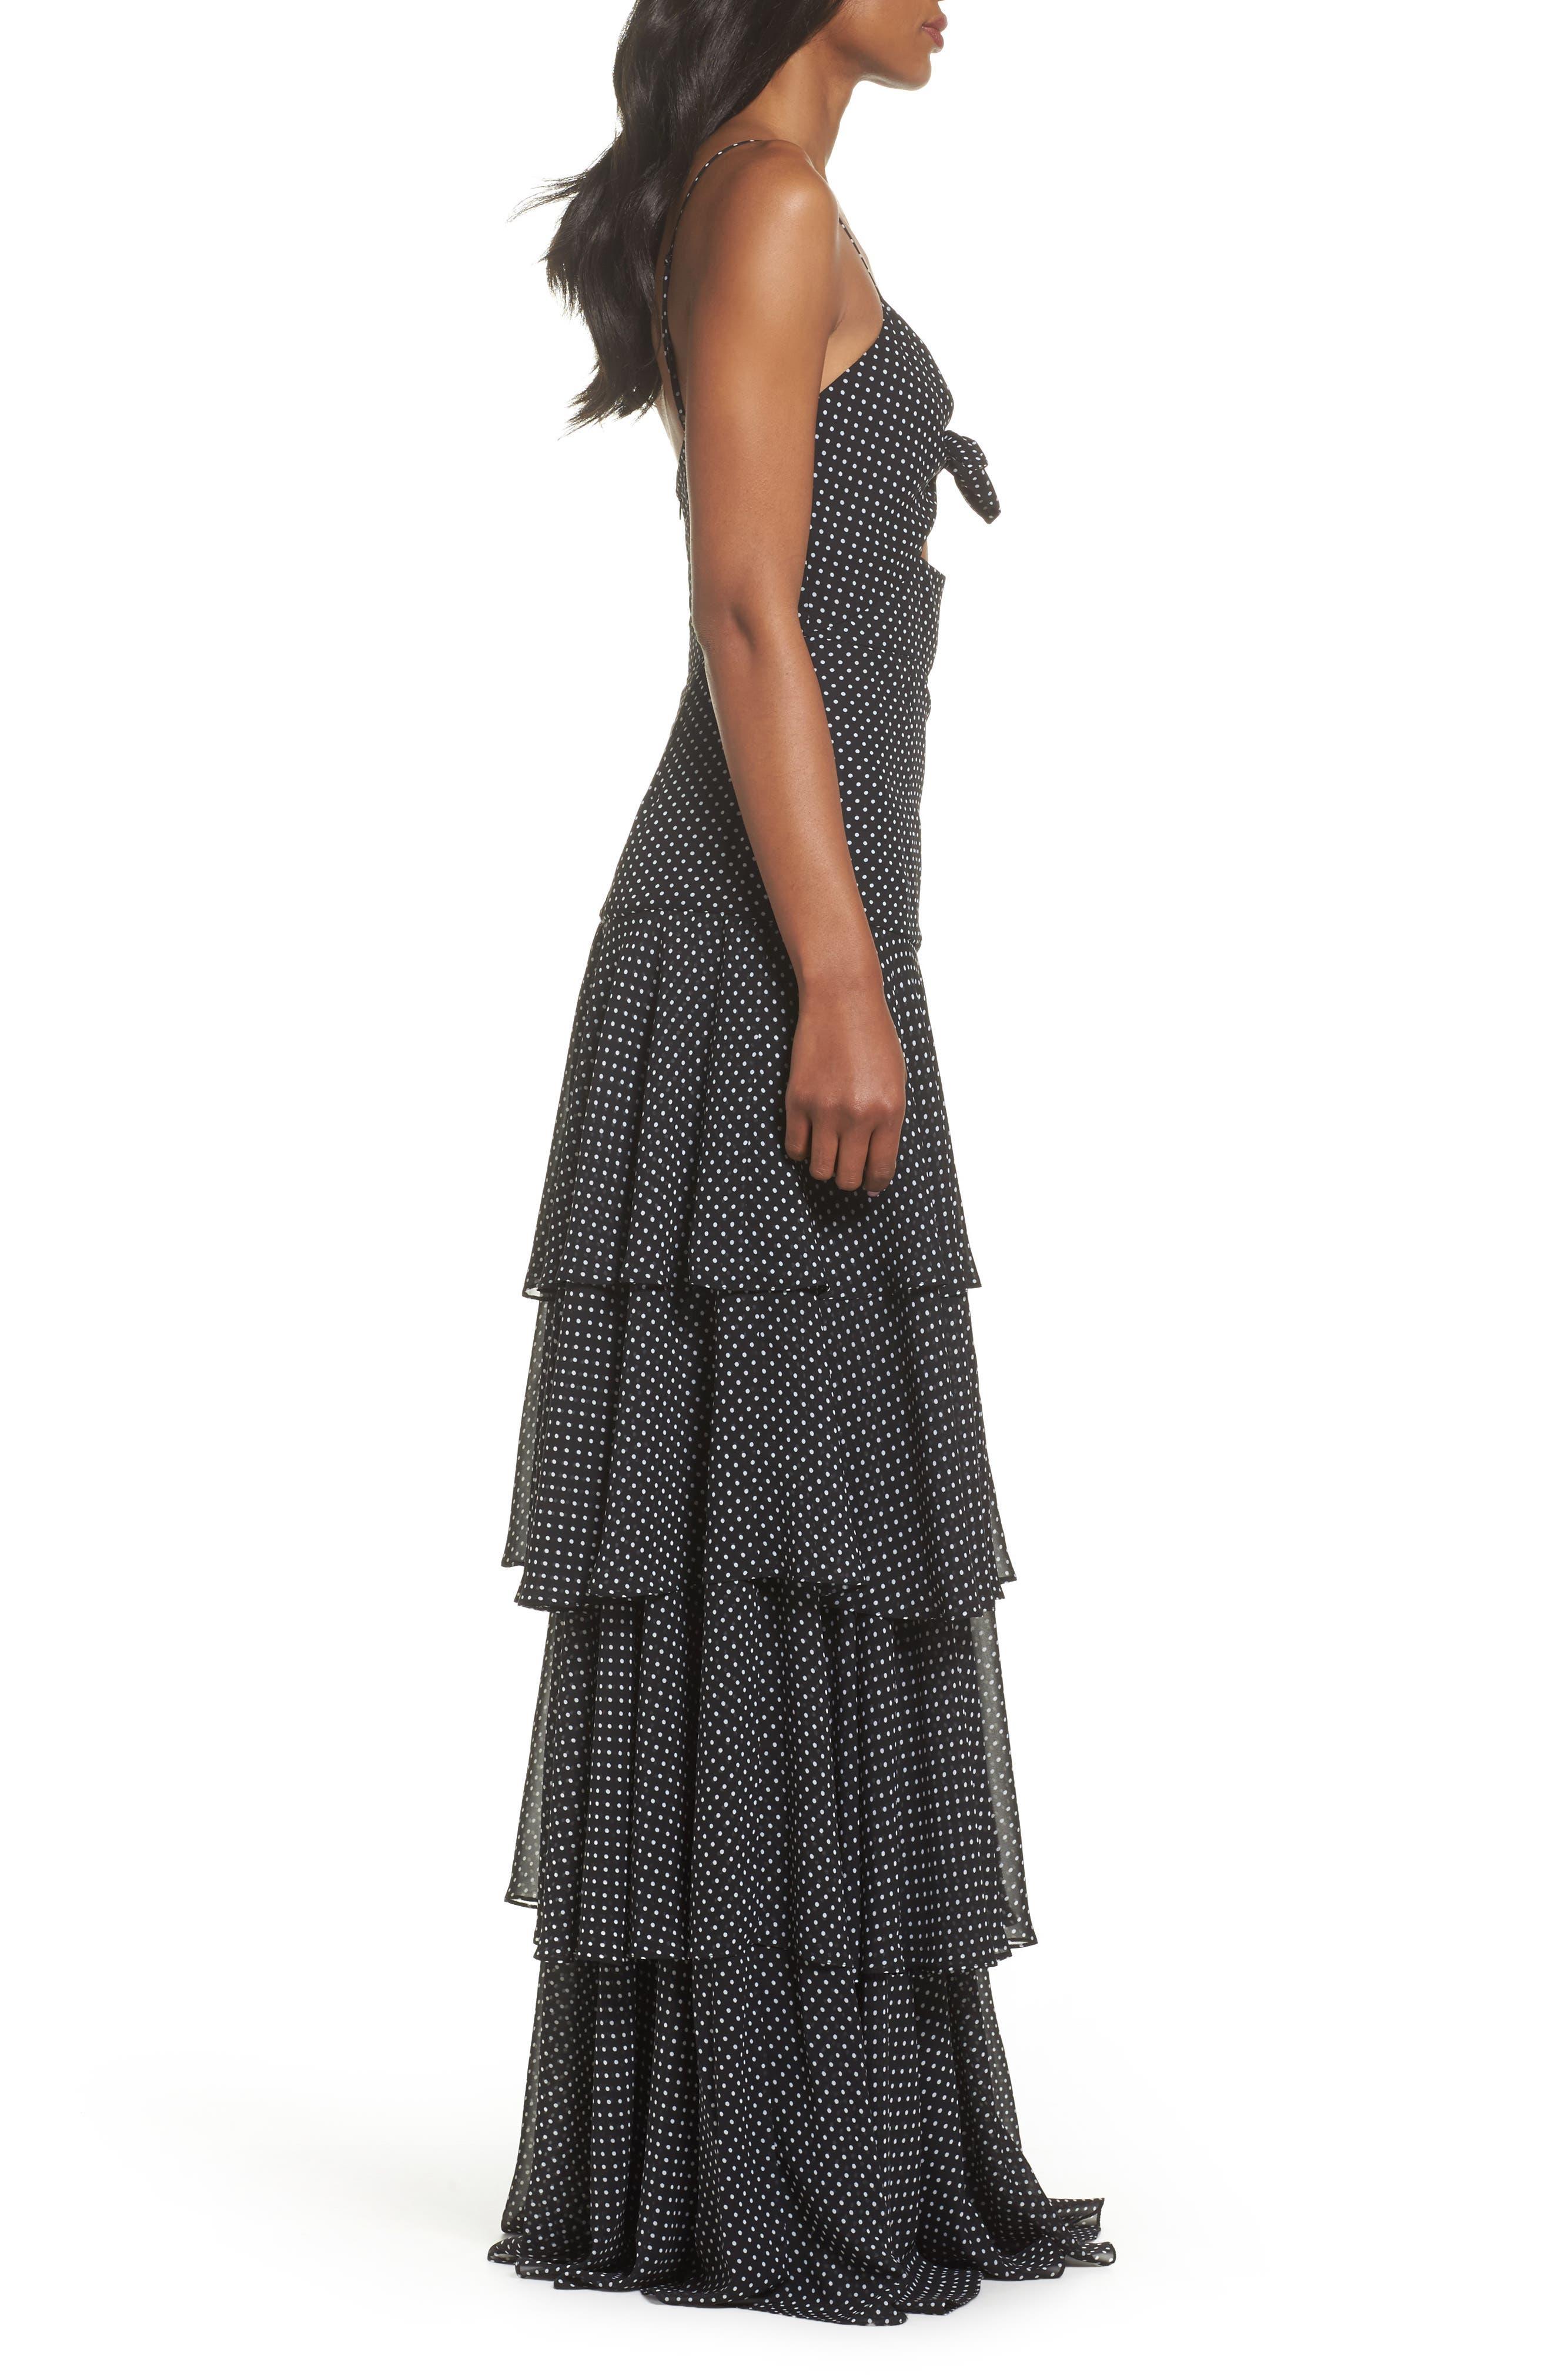 Polka Dot Tiered Gown,                             Alternate thumbnail 2, color,                             Black/ White